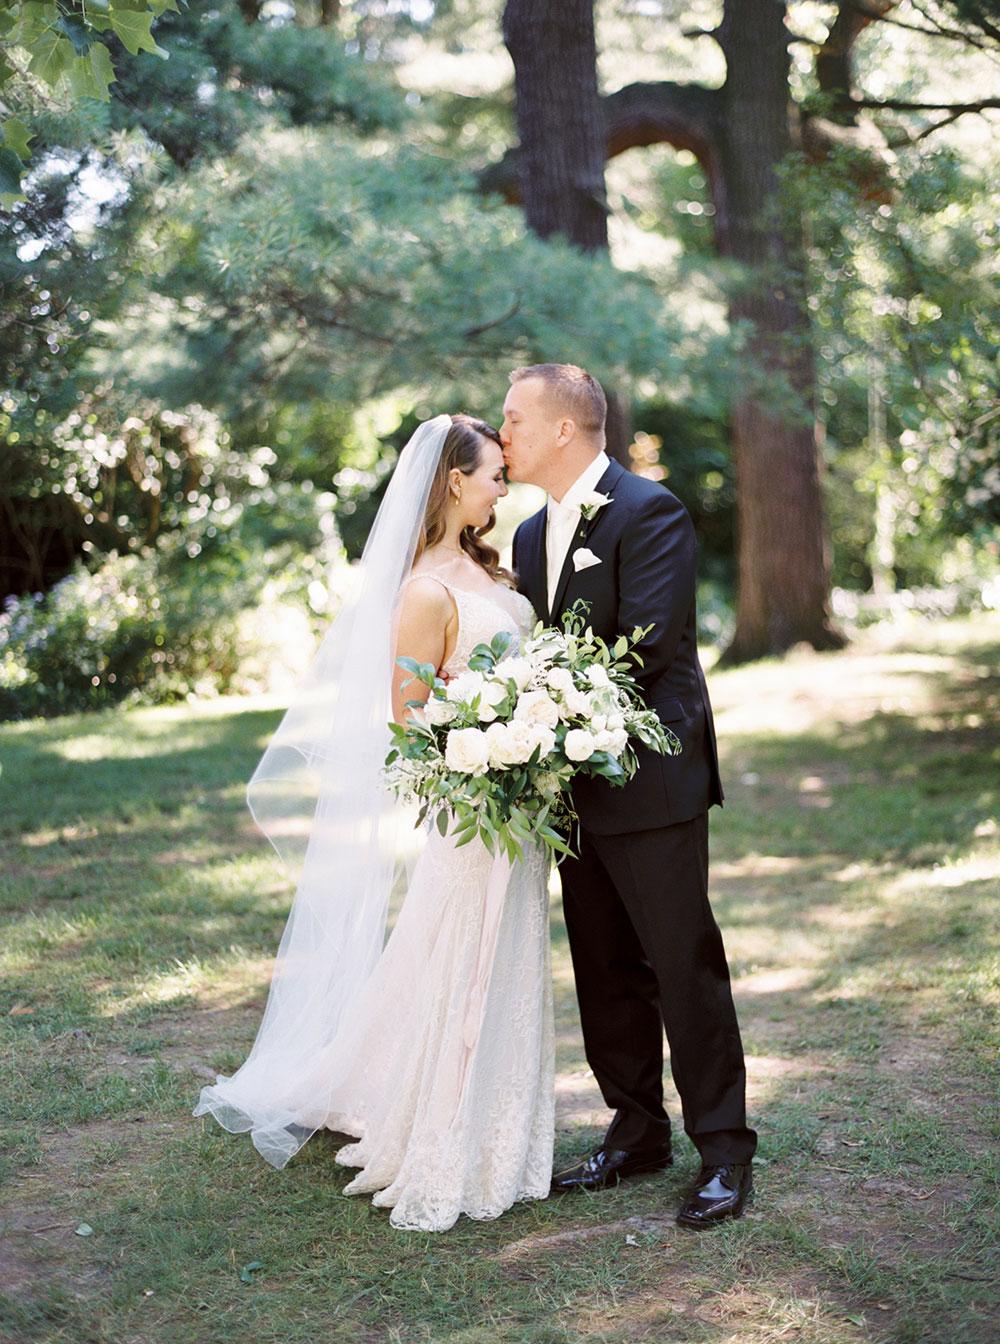 kurtz-orchards-wedding-gracewood-estate-niagara-on-the-lake-photo-by-katie-nicolle-photography-0057.JPG